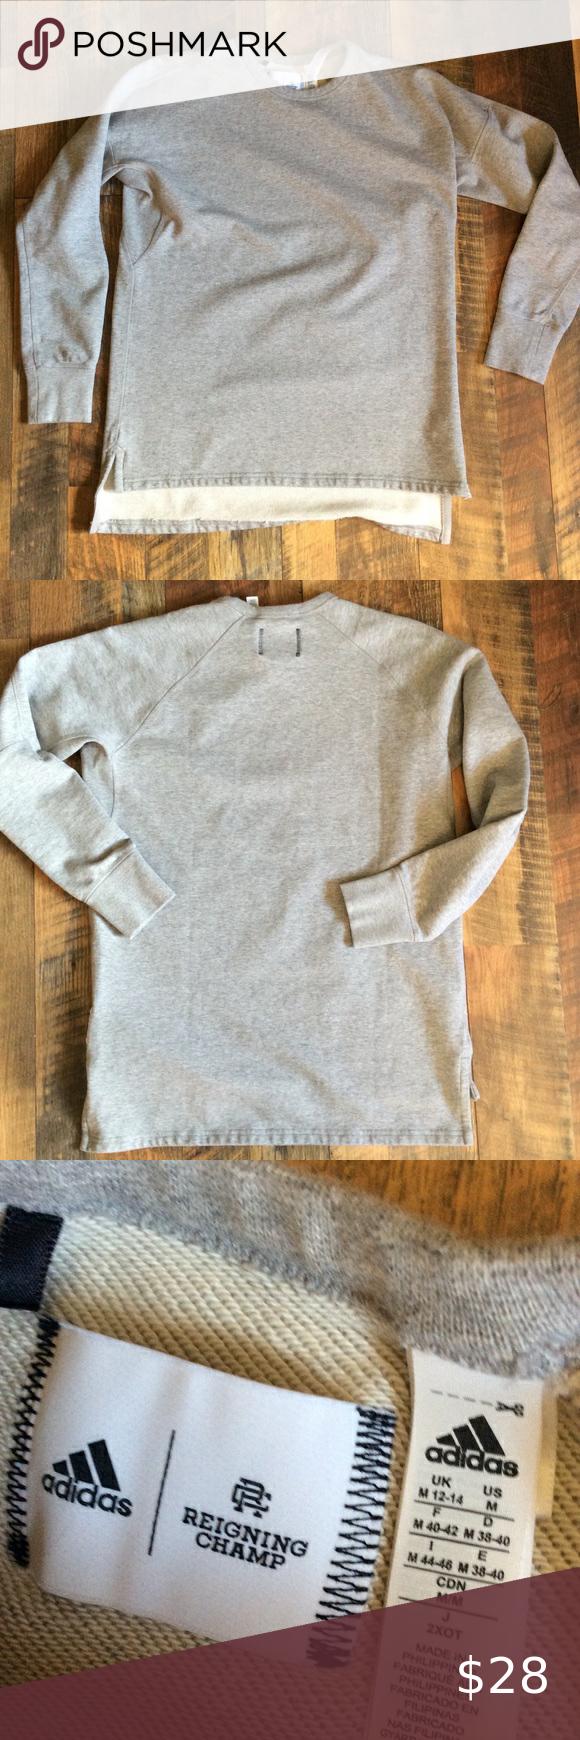 Adidas Reigning Champ Sweatshirt M Reigning Champ Grey Adidas Hoodie Adidas Zip Up Hoodie [ 1740 x 580 Pixel ]